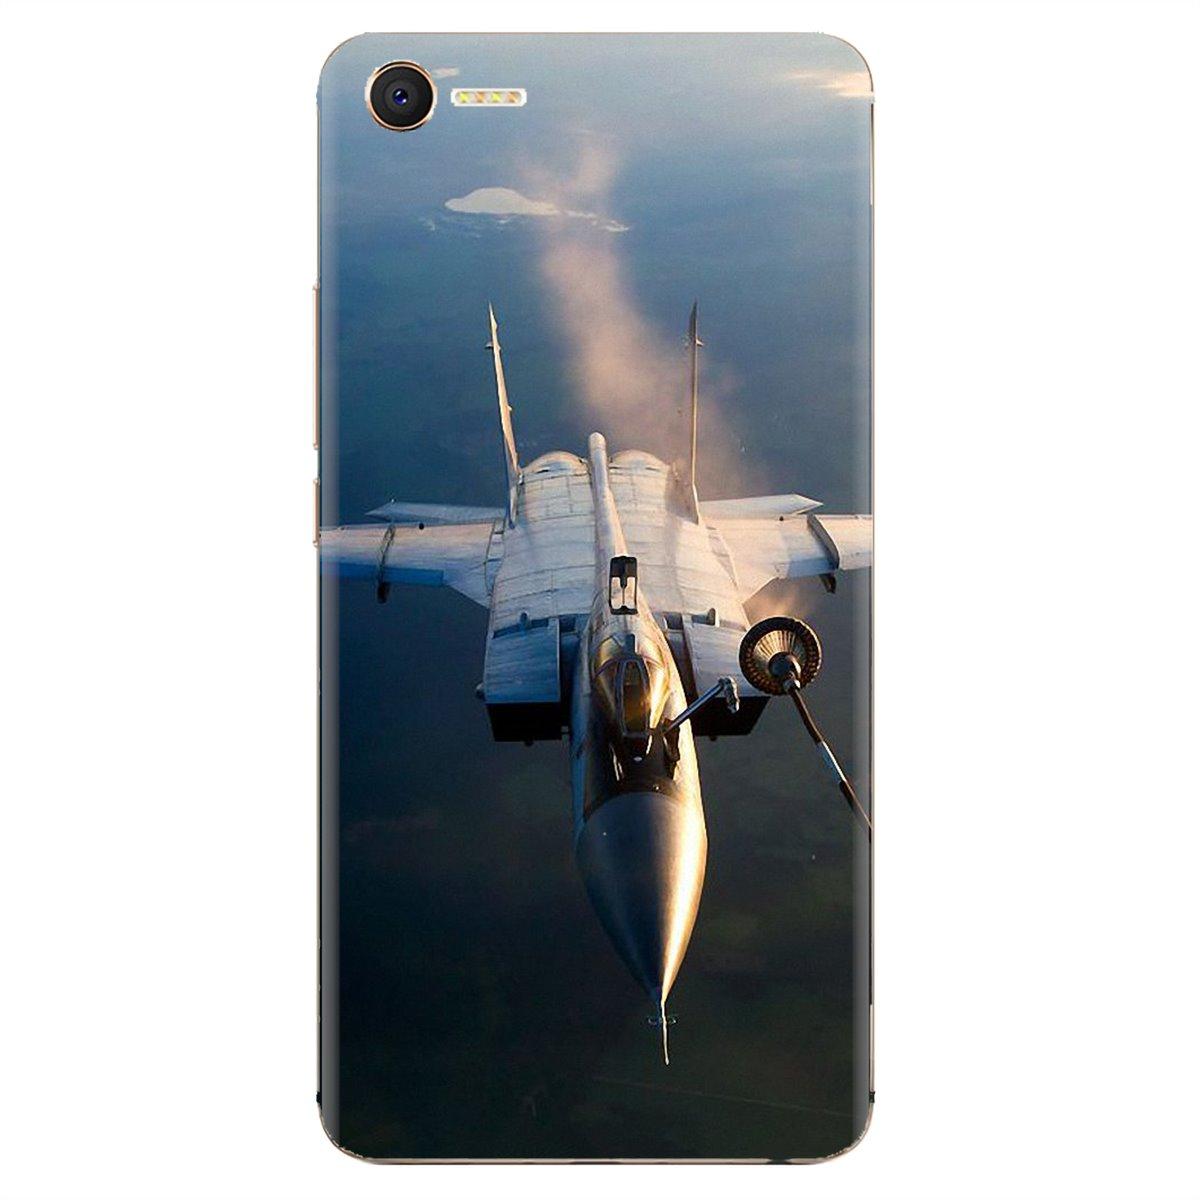 Russian Mig 31 Jet Fighting Falcon For Xiaomi Mi A1 A2 A3 5X 6X 8 9 9t Lite SE Pro Mi Max Mix 1 2 3 2S Anime Silicone Phone Case